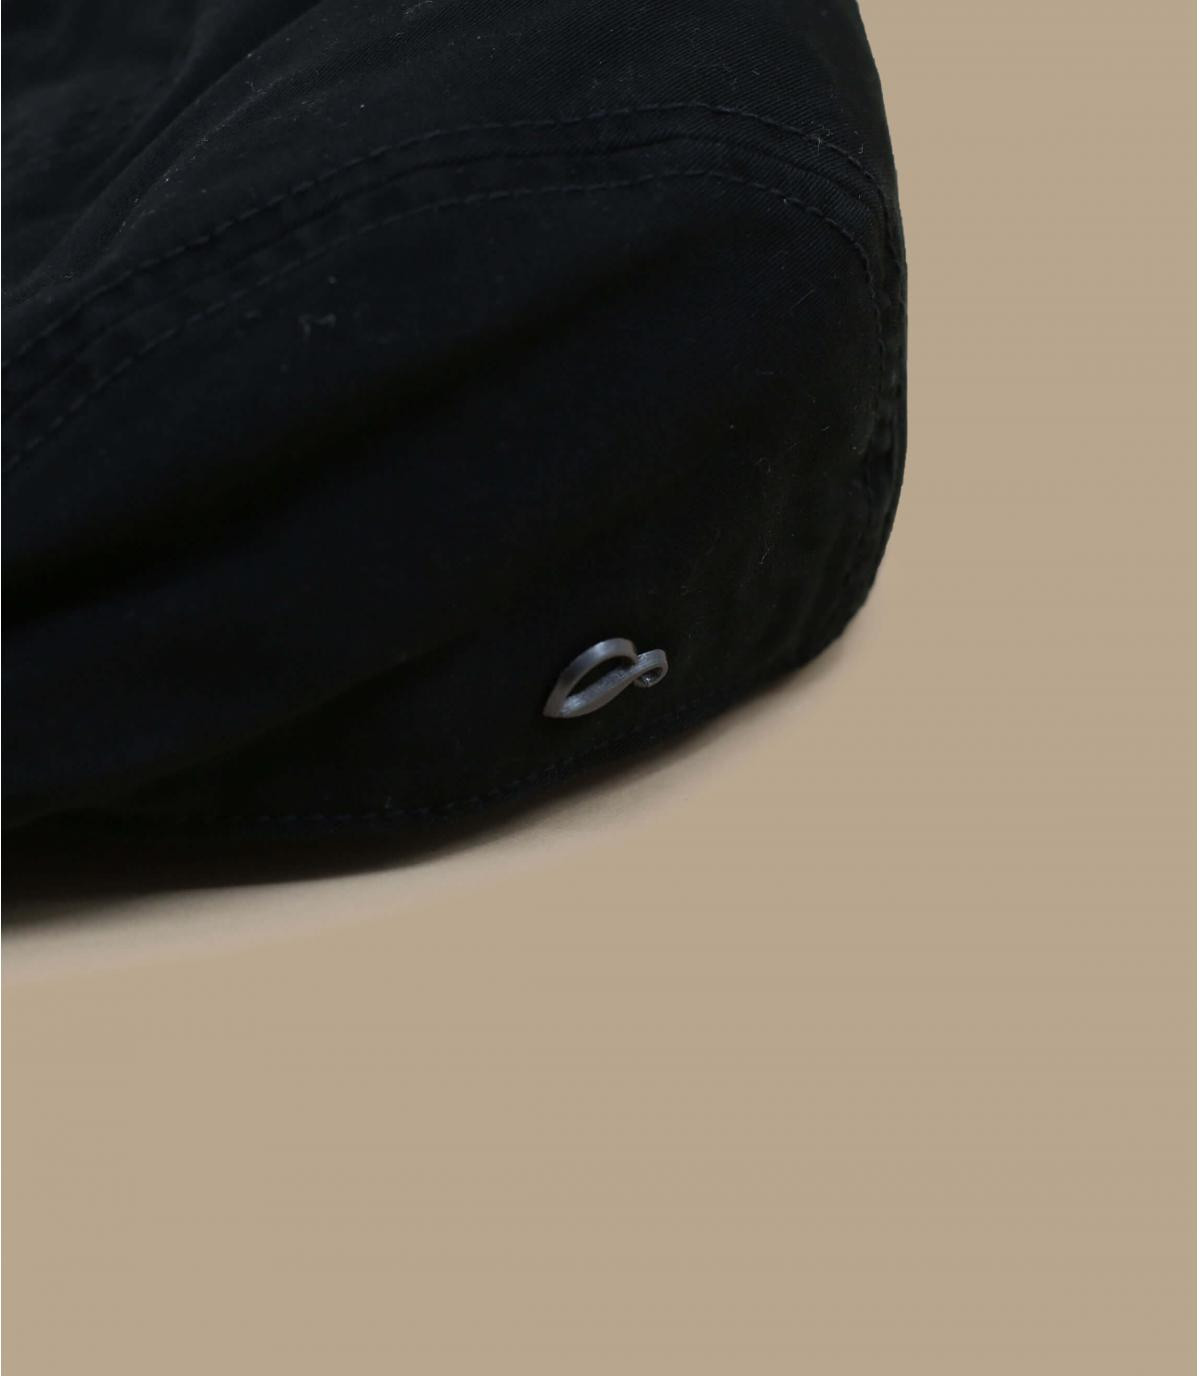 béret coton noir Göttmann